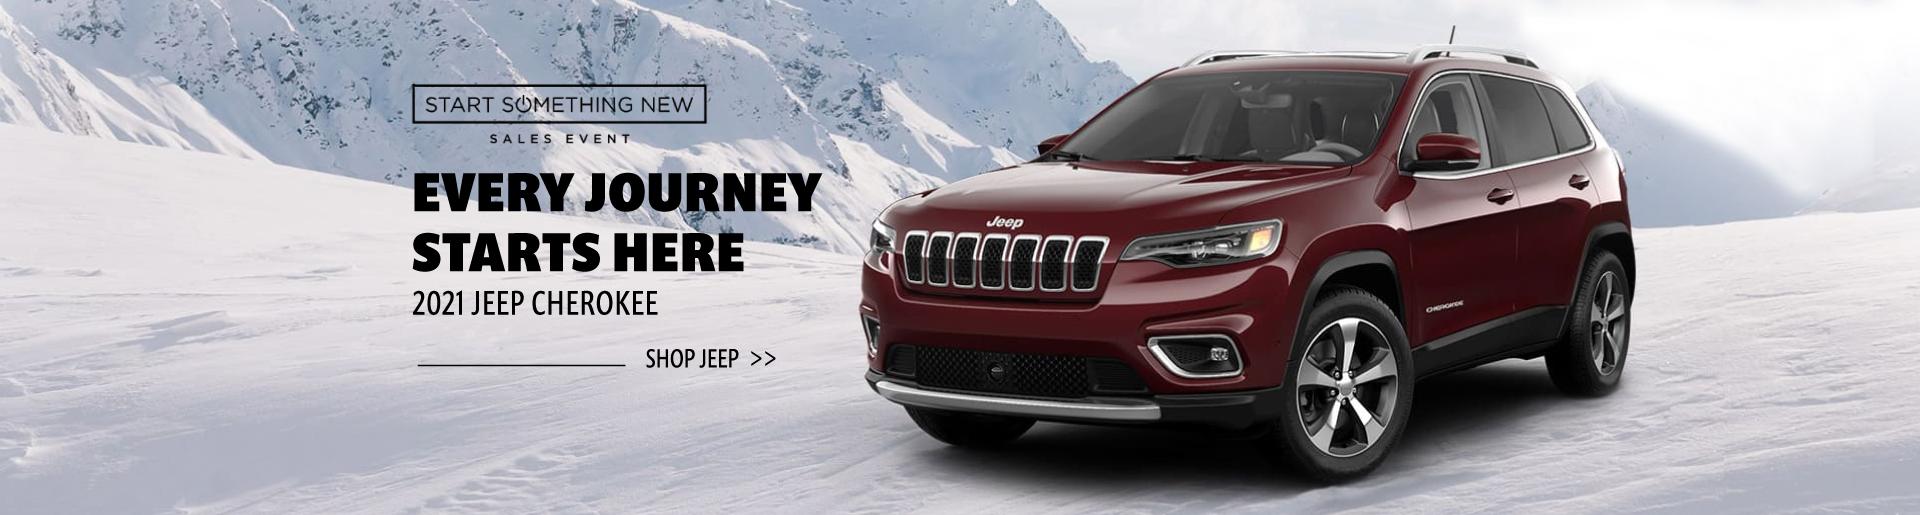 2021 Jeep Cherokee Generic- January 2021